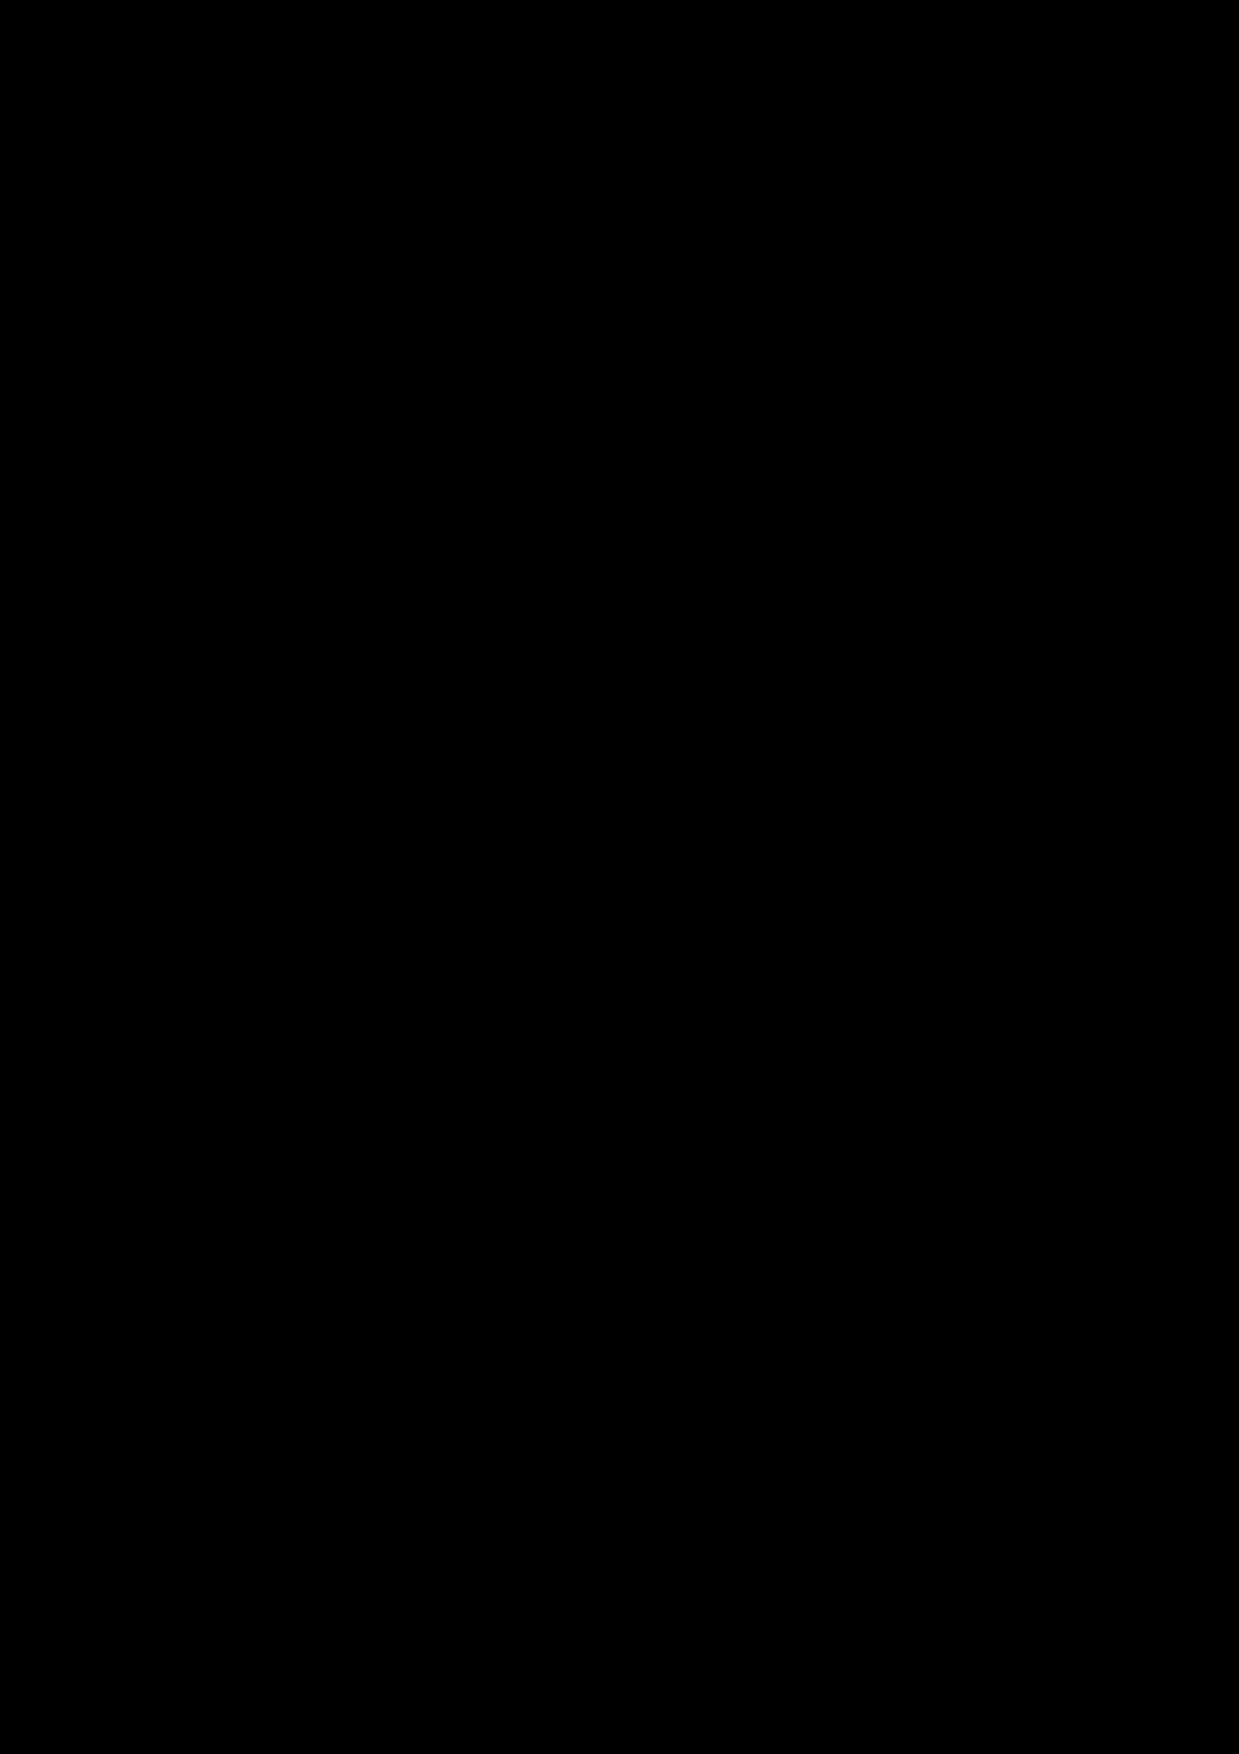 TESTBANKCORP